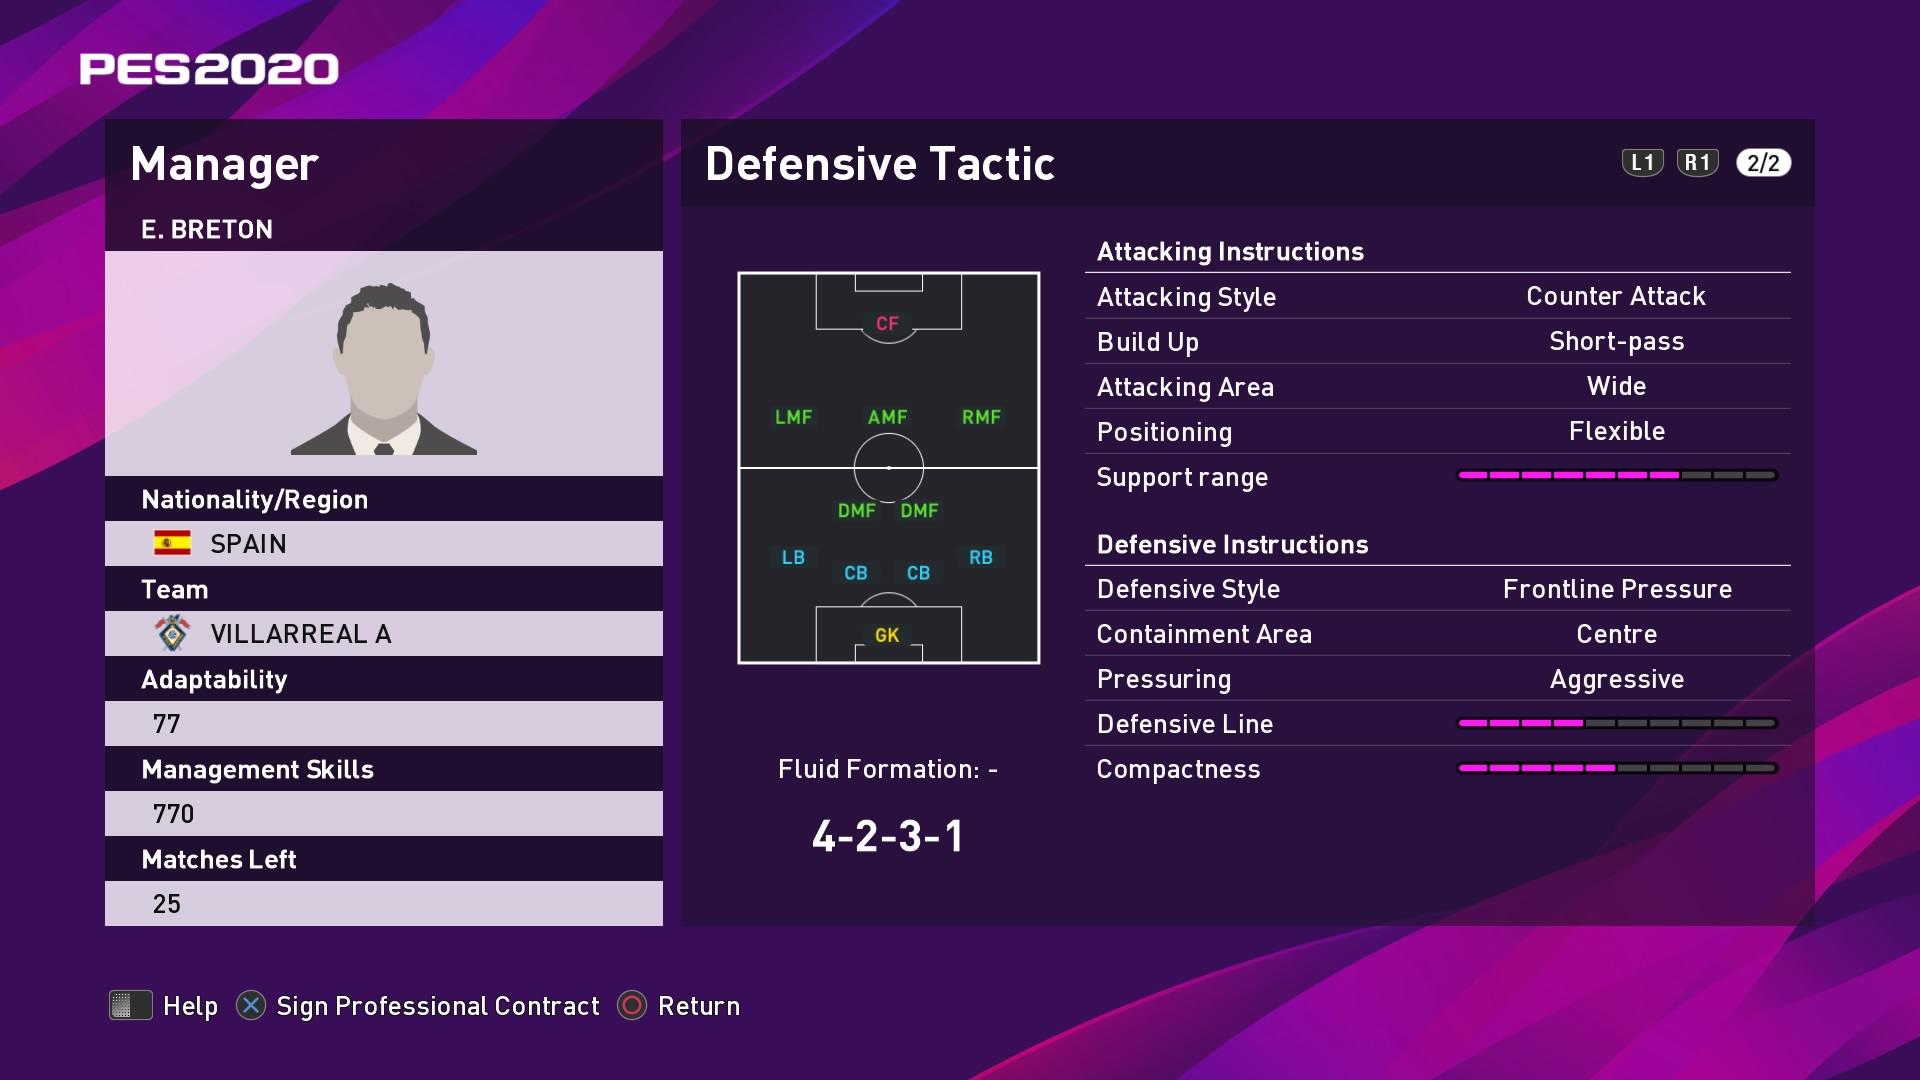 E. Breton (2) (Javier Calleja) Defensive Tactic in PES 2020 myClub